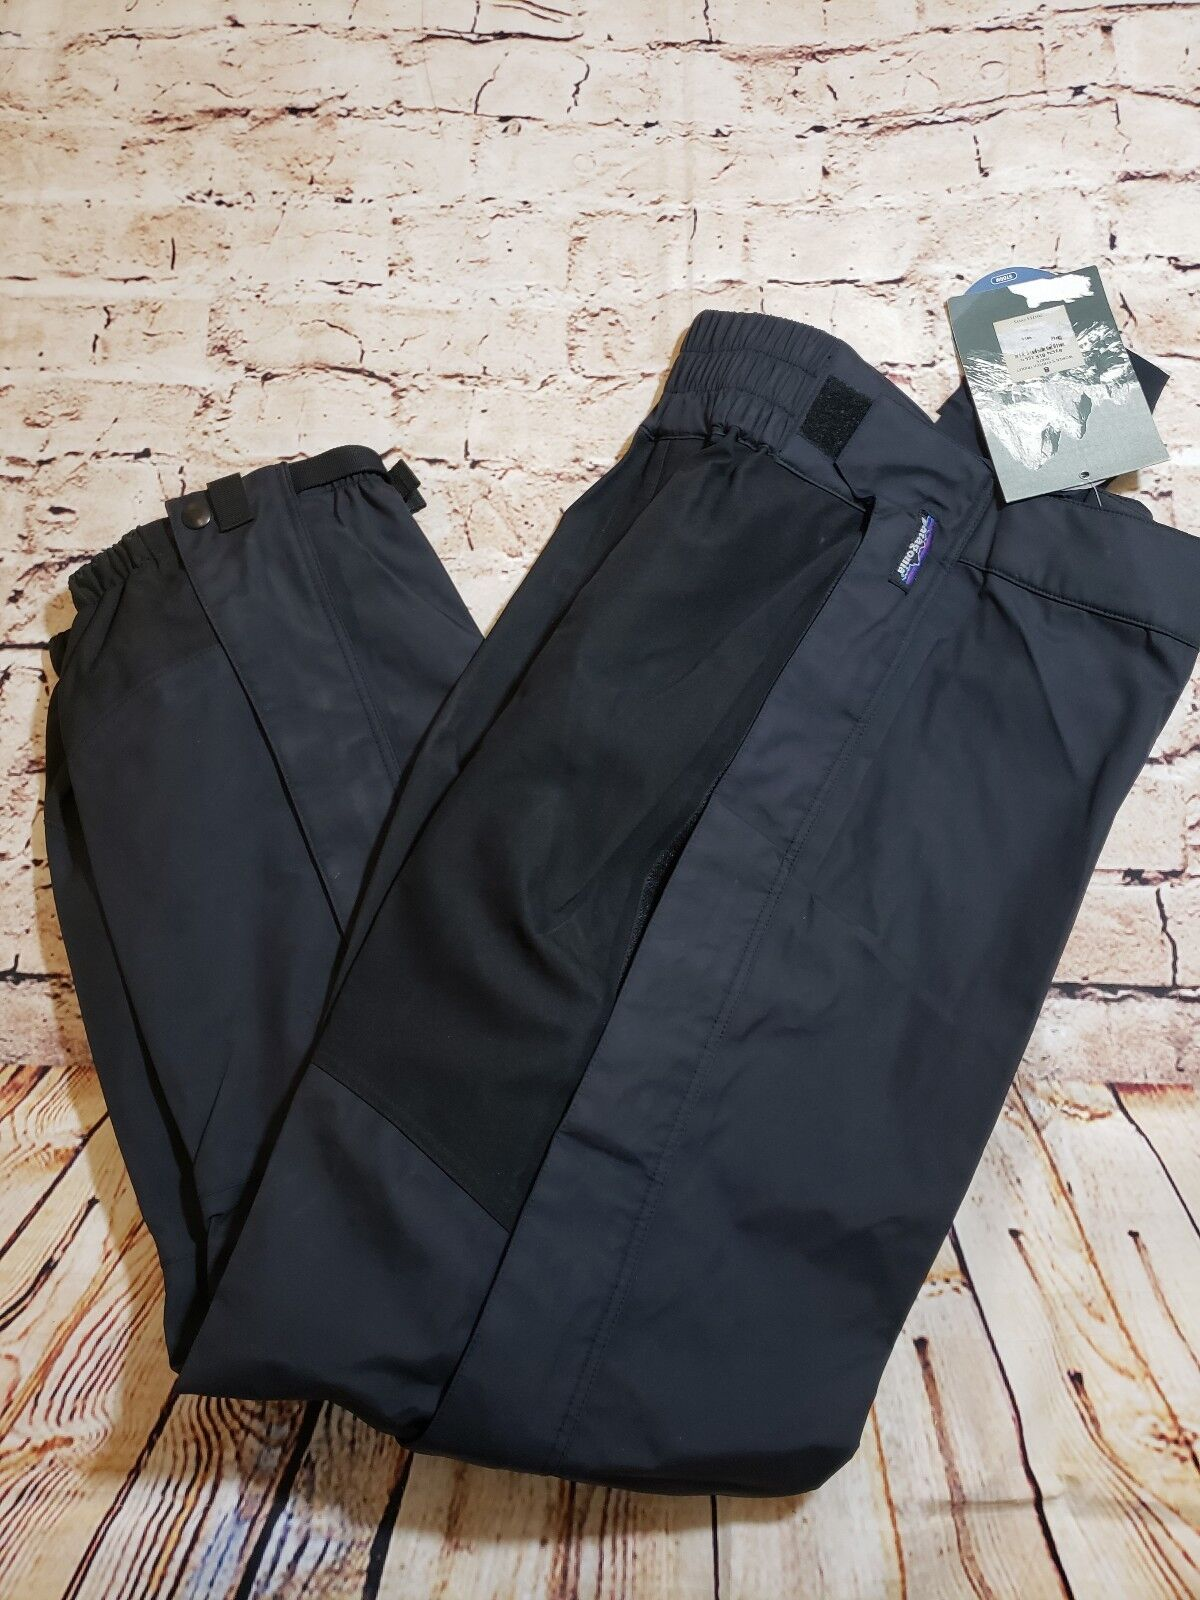 NWT   349 PATAGONIA Women's Stretch Triolet Pants Size 10 Ski Snowboard pants